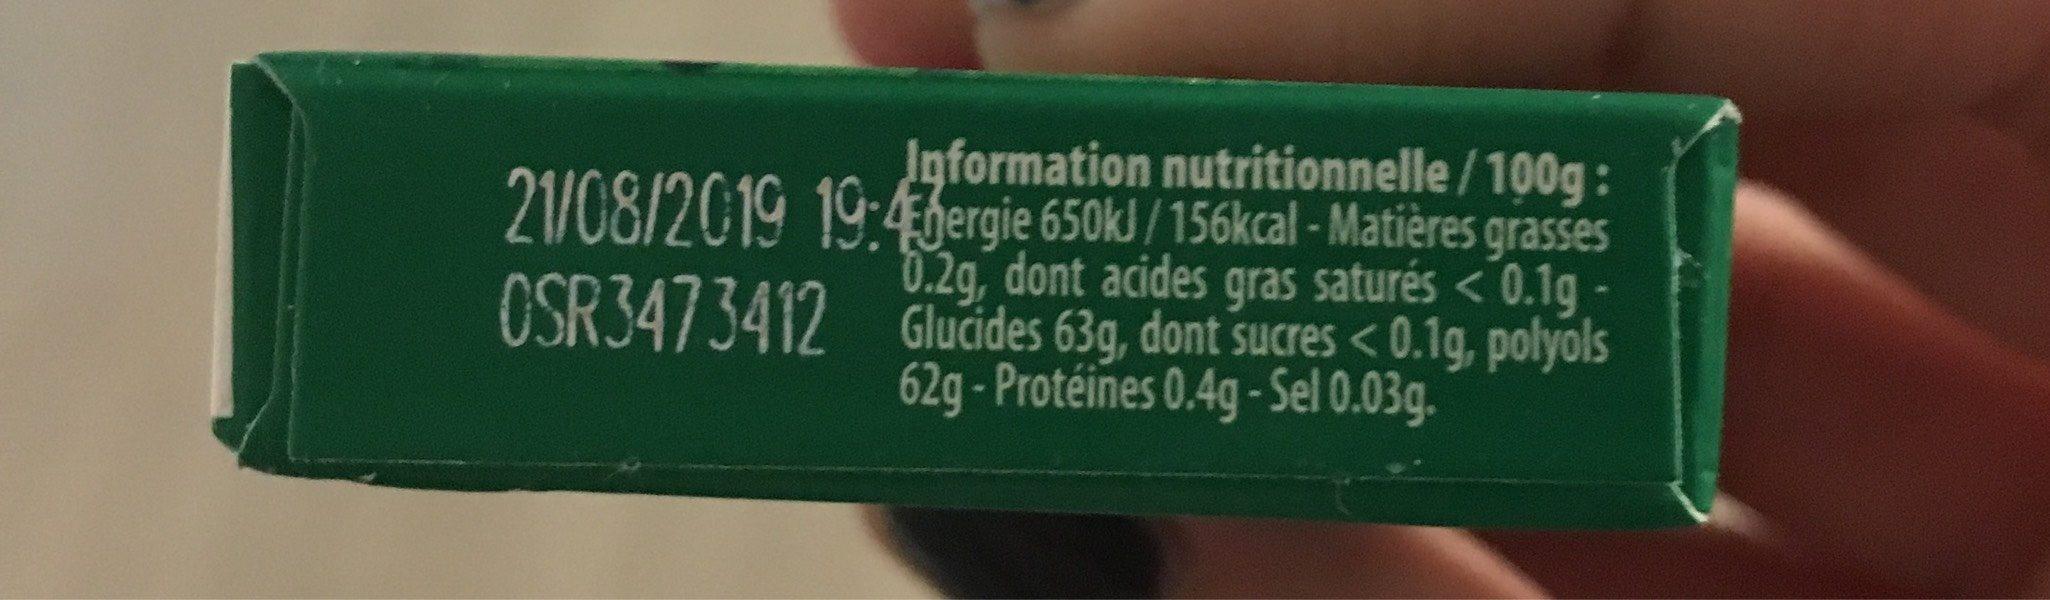 Hwd greenfresh x5 oe - Nutrition facts